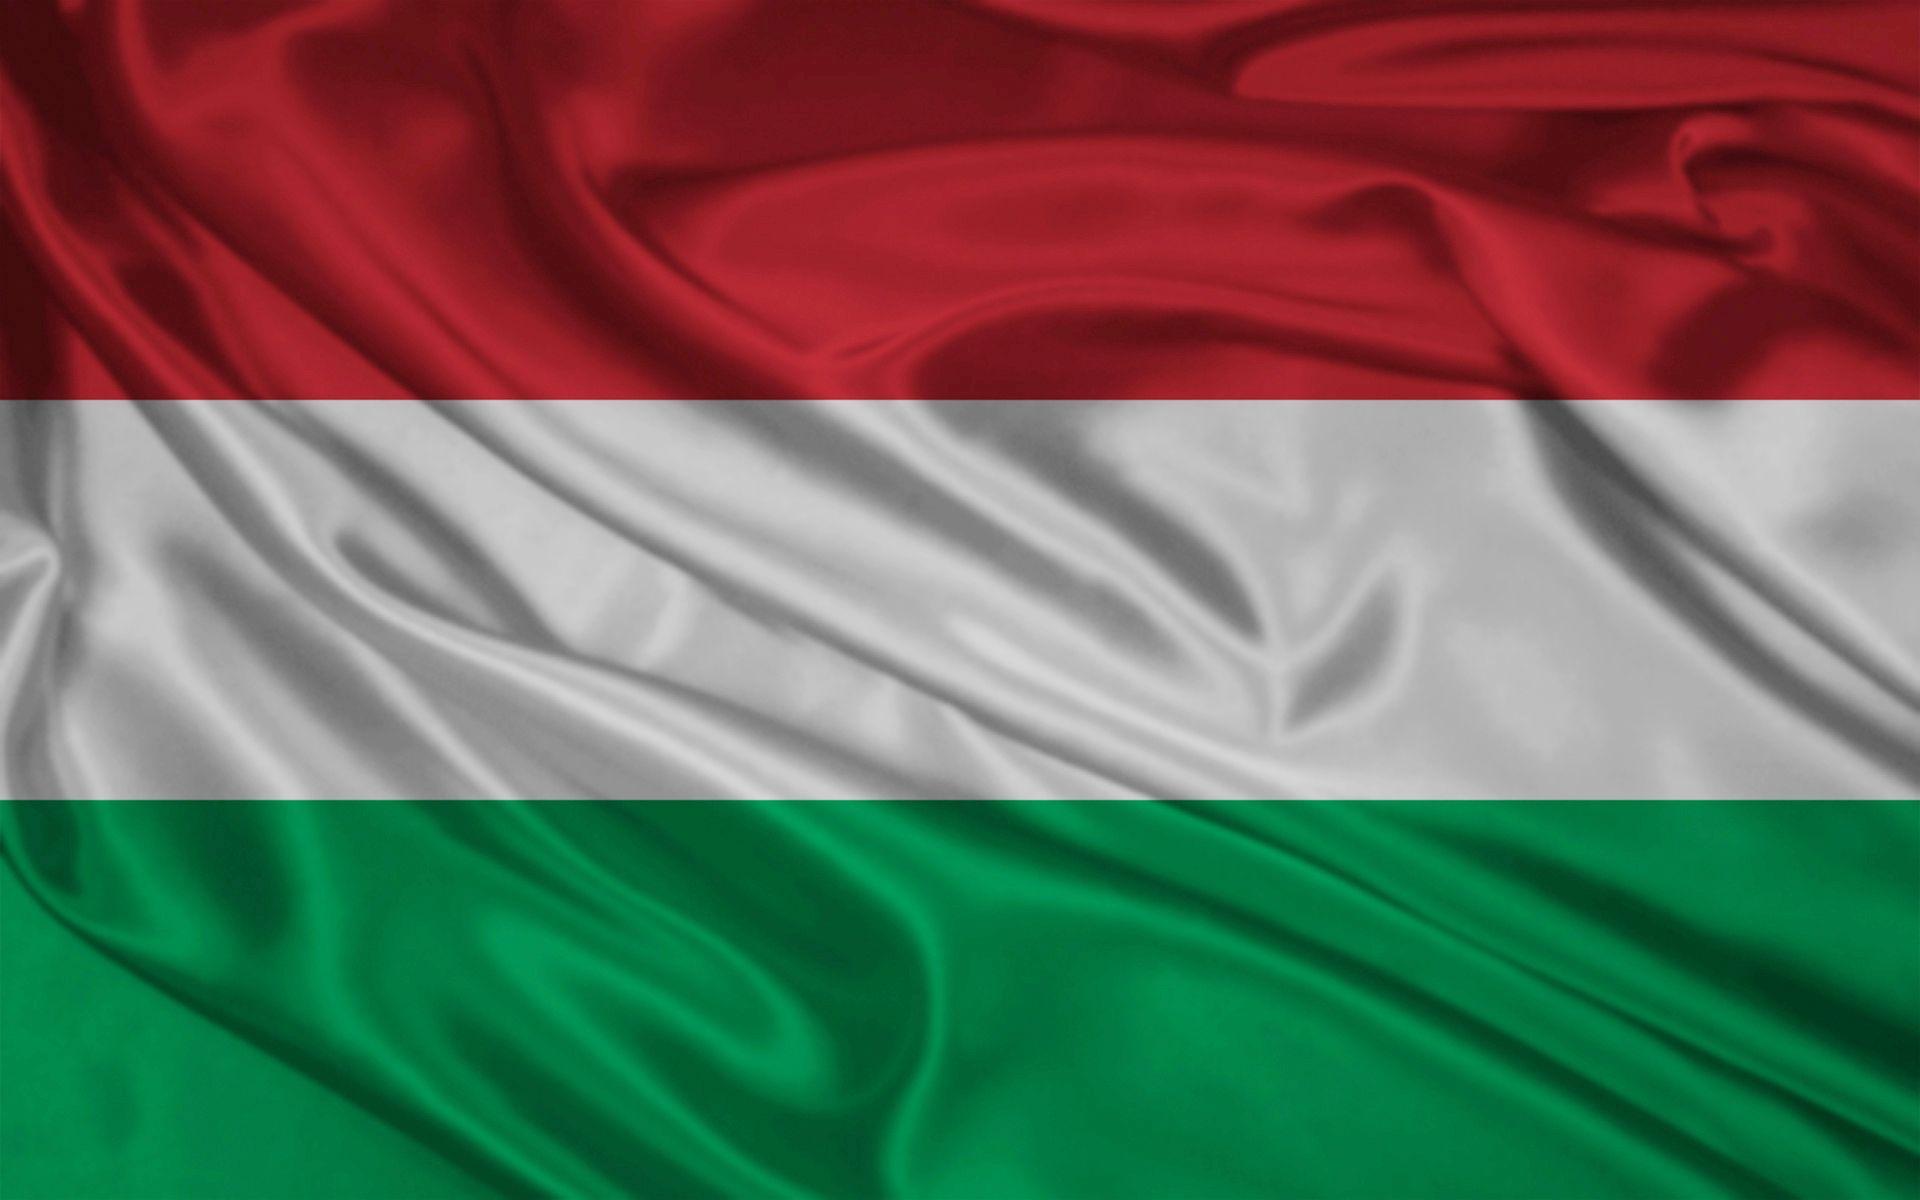 1920x1200 Hungary Flag Desktop Pc And Mac Wallpaper Ethiopia Flag Hungary Flag Flag